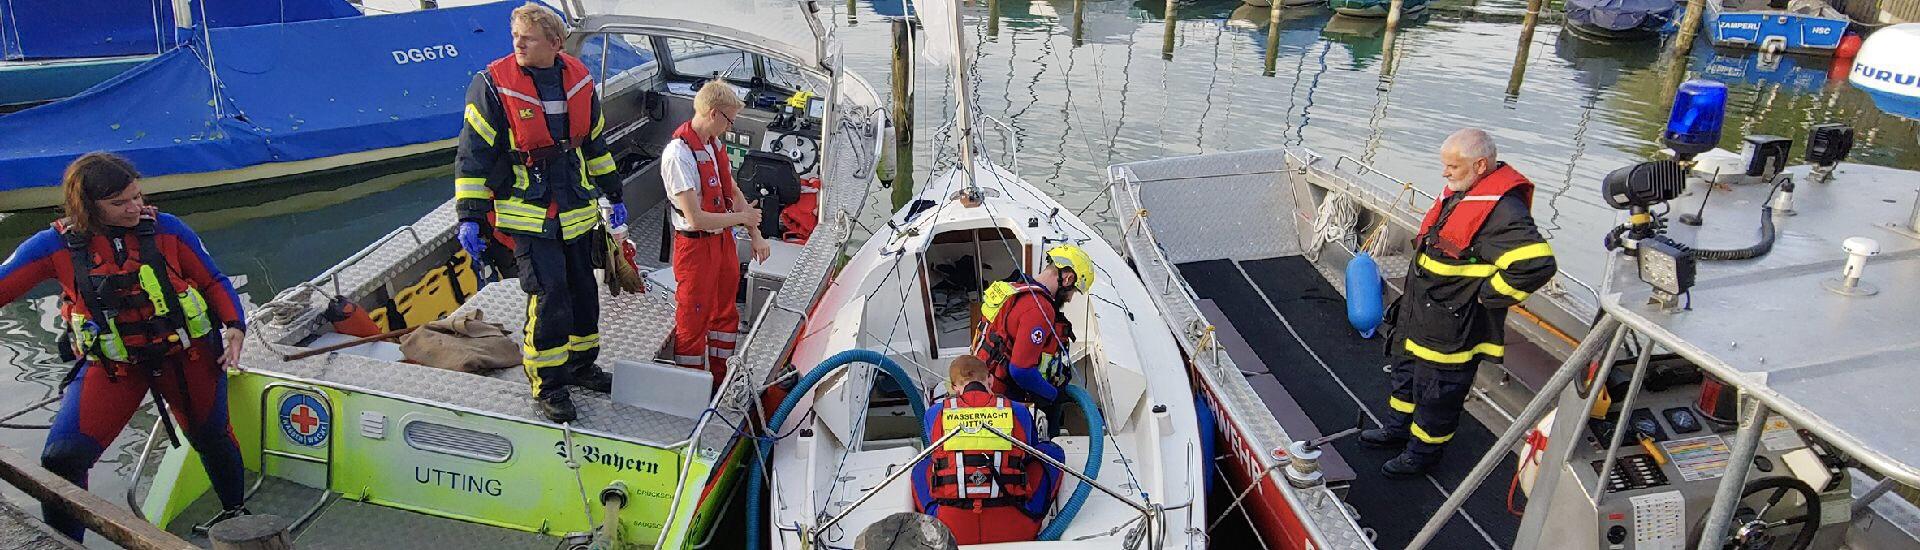 Bergung Segelboot Herrsching 2019